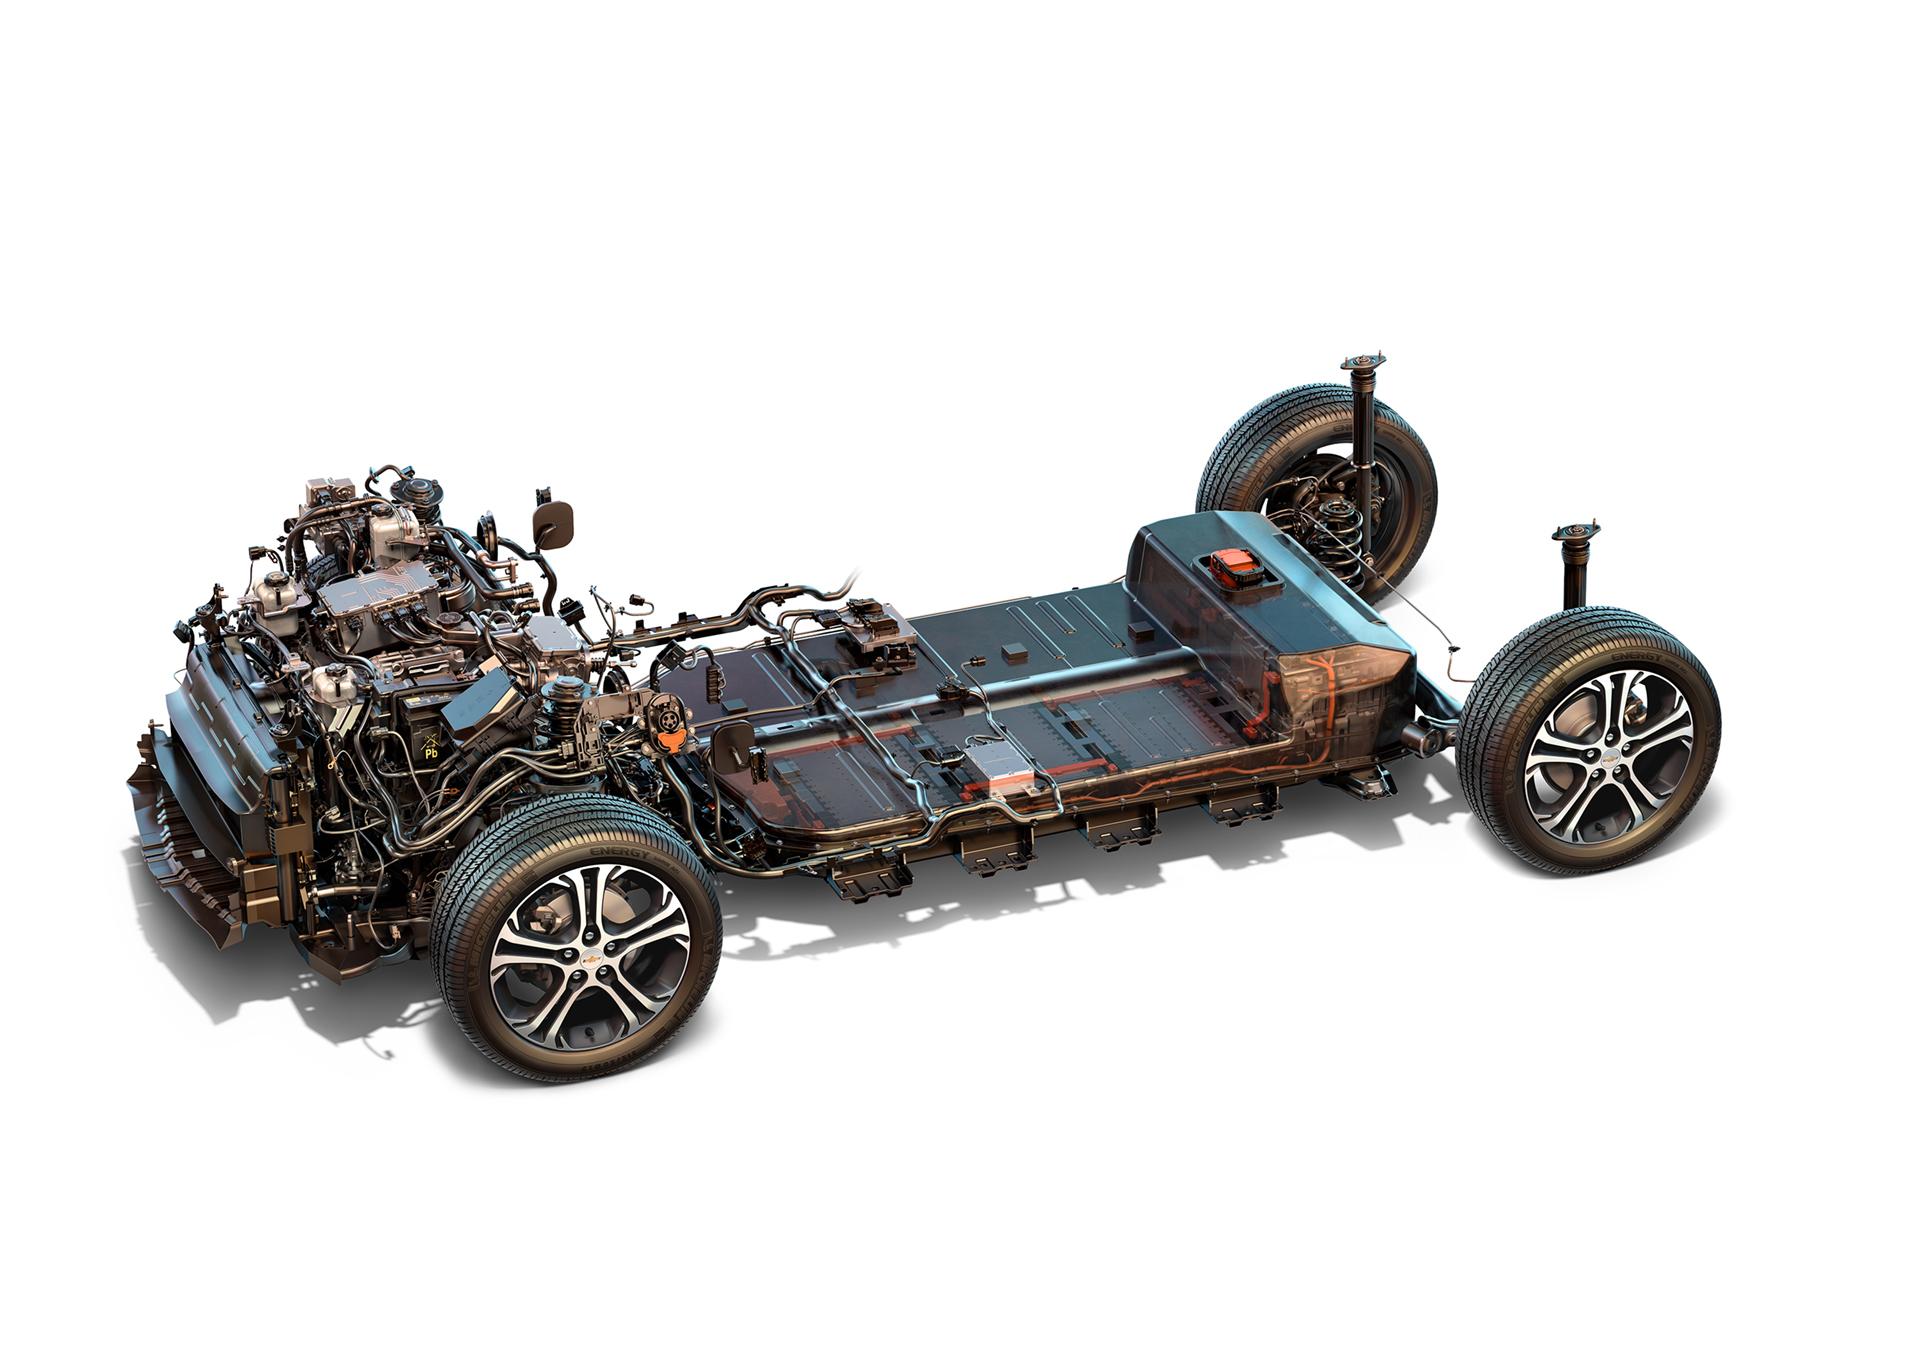 Chevrolet Bolt EV - 2016 - powertrain - General Motors